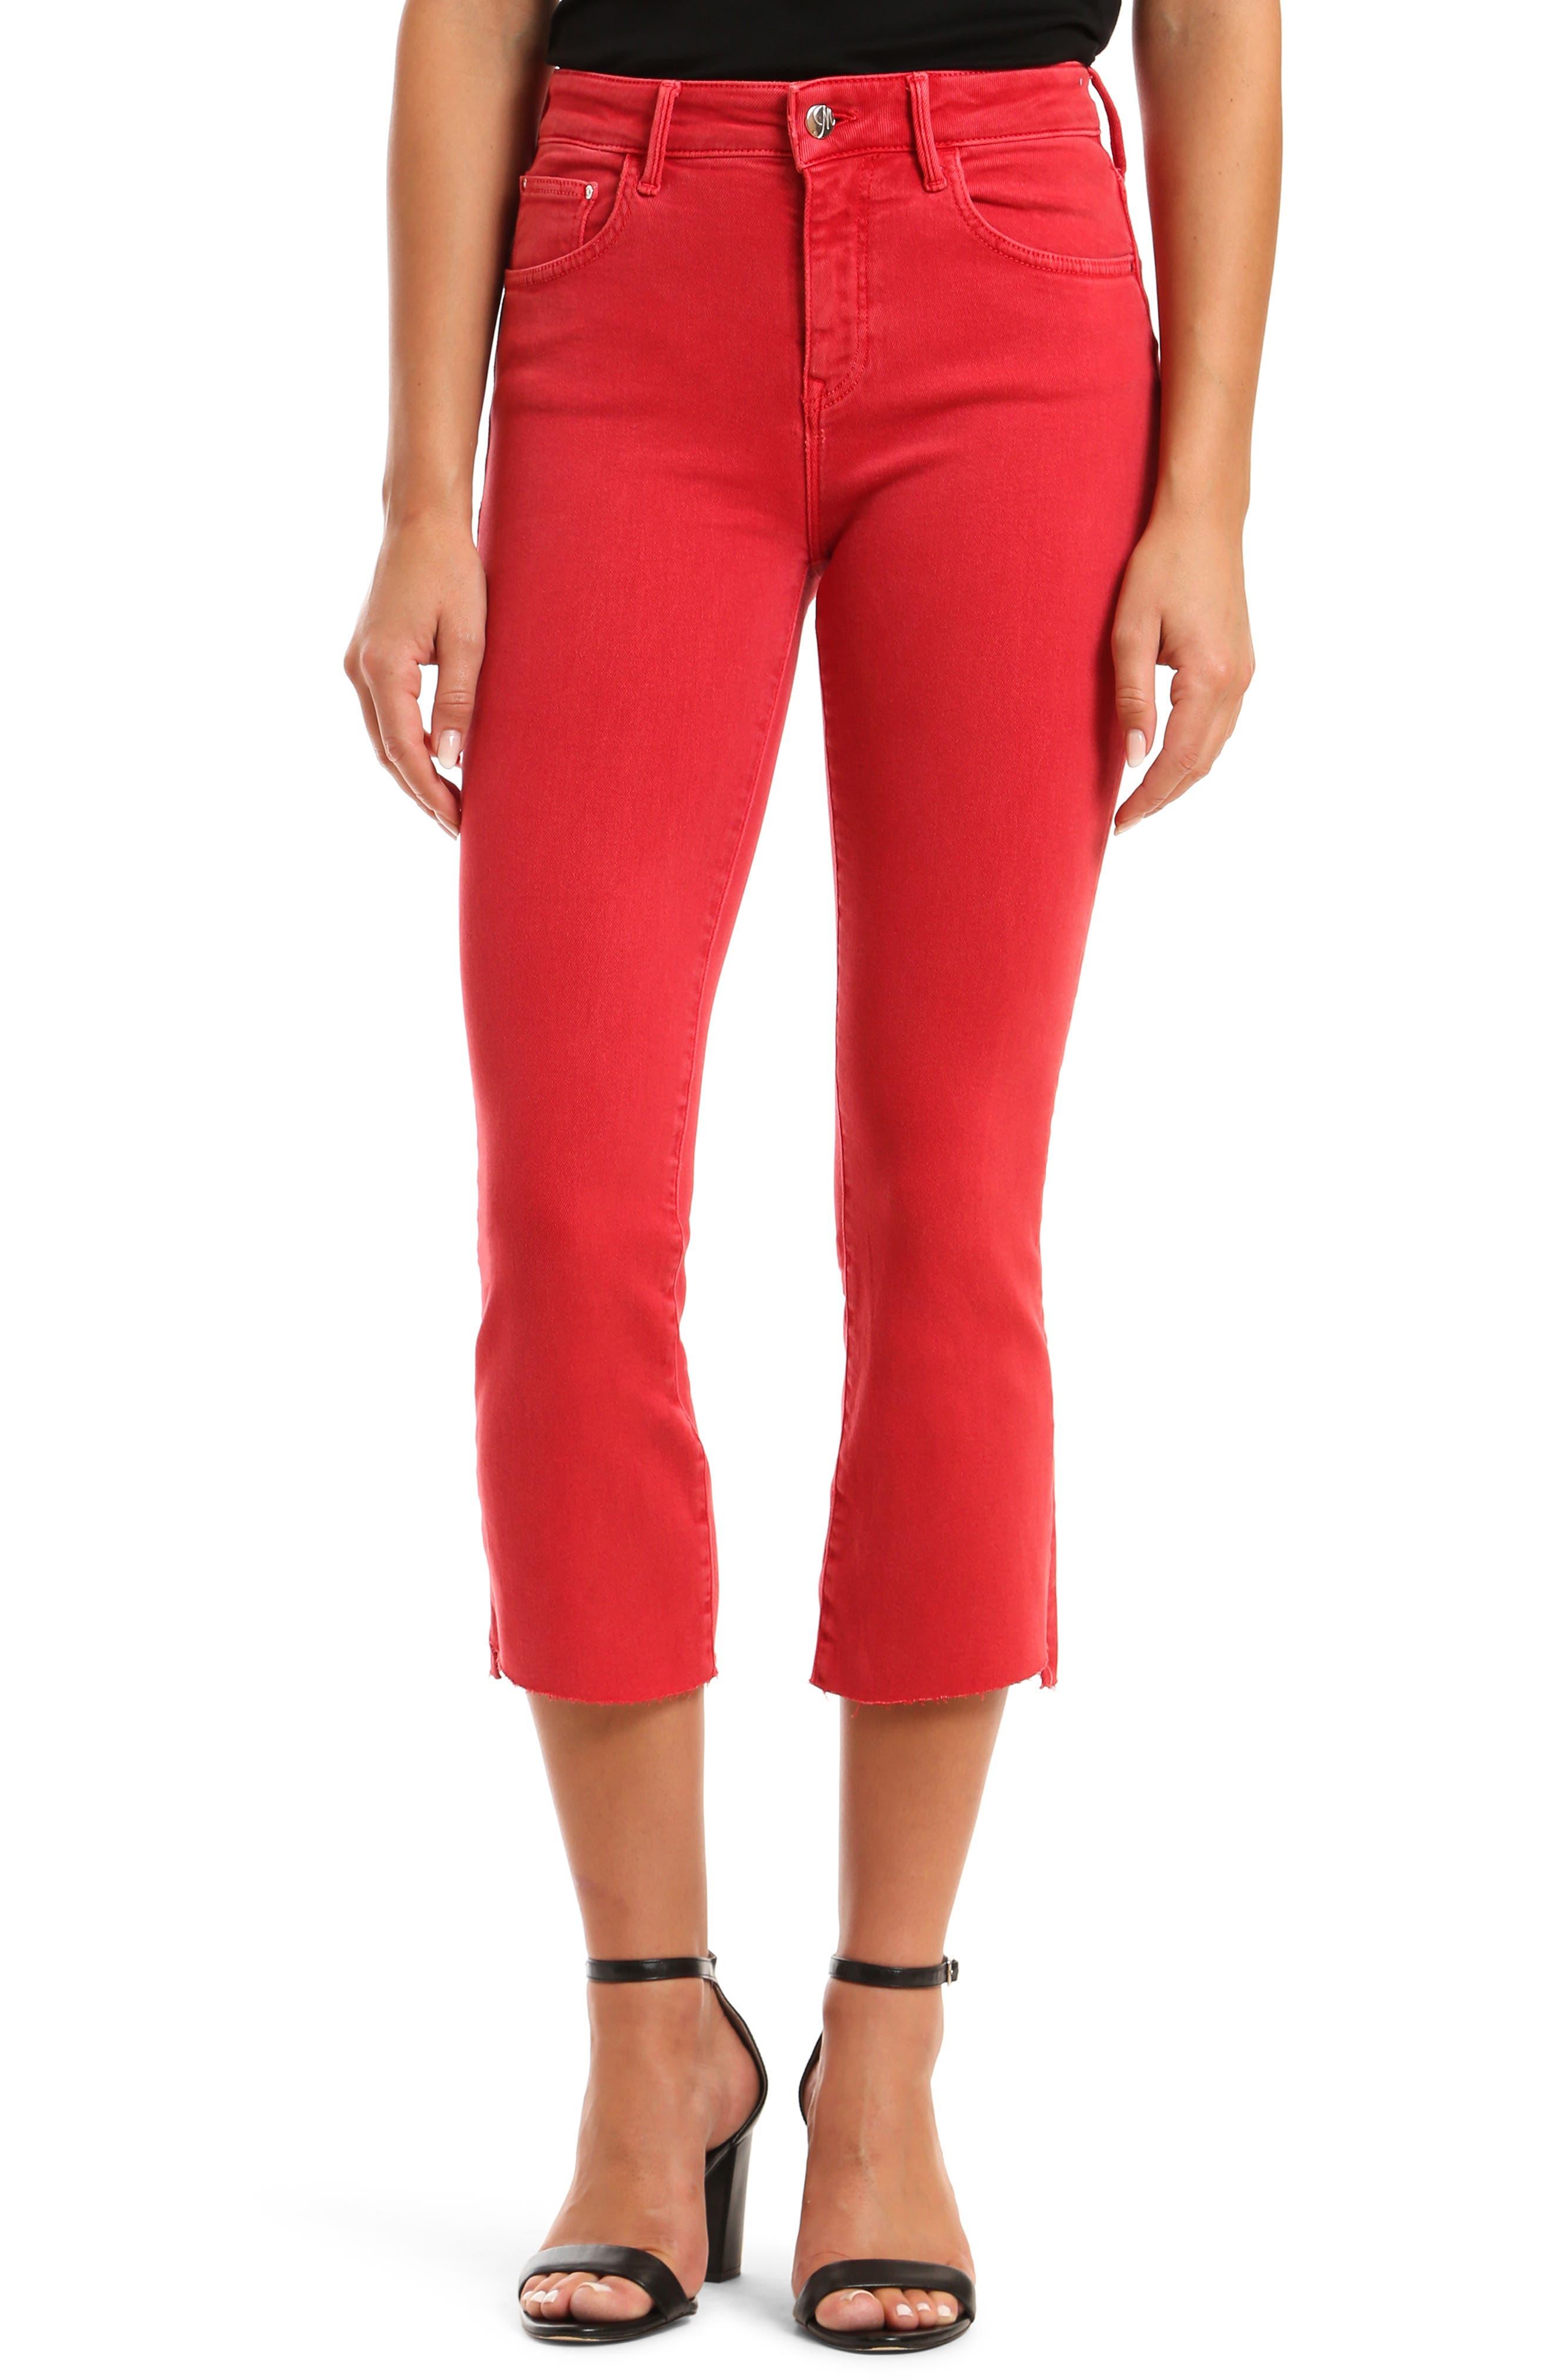 Anika High Waist Crop Flare Jeans